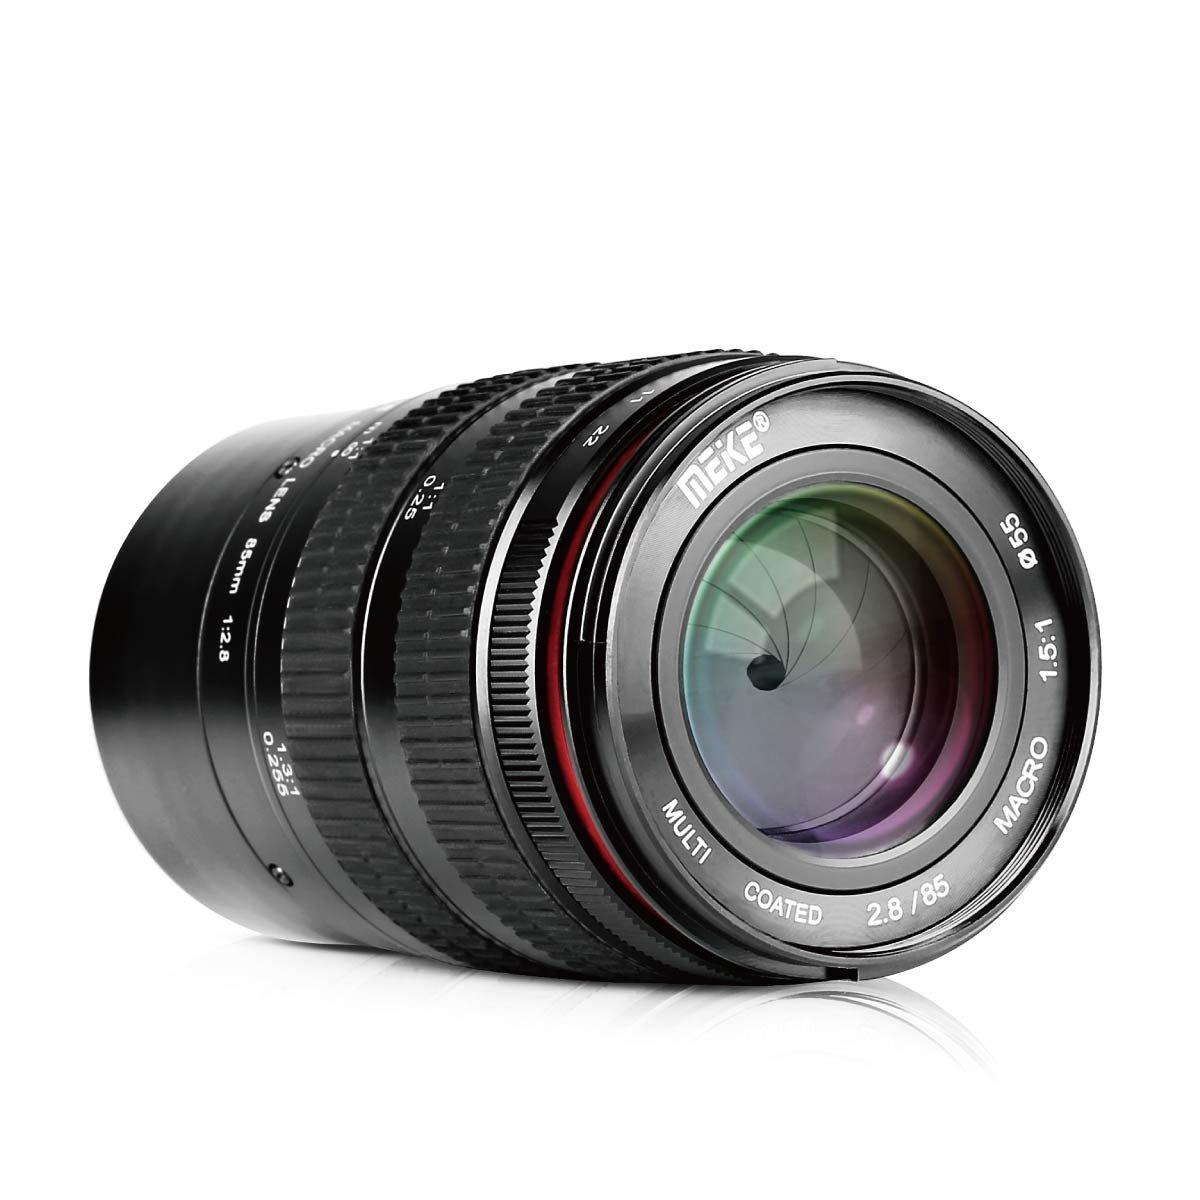 Meike 85mm F/2.8 Manual Focus Aspherical Medium Telephoto Full Frame Prime Macro Lens with Portrait Capability for Sony E-Mount Digital Mirrorless DSLR Cameras by MEKE